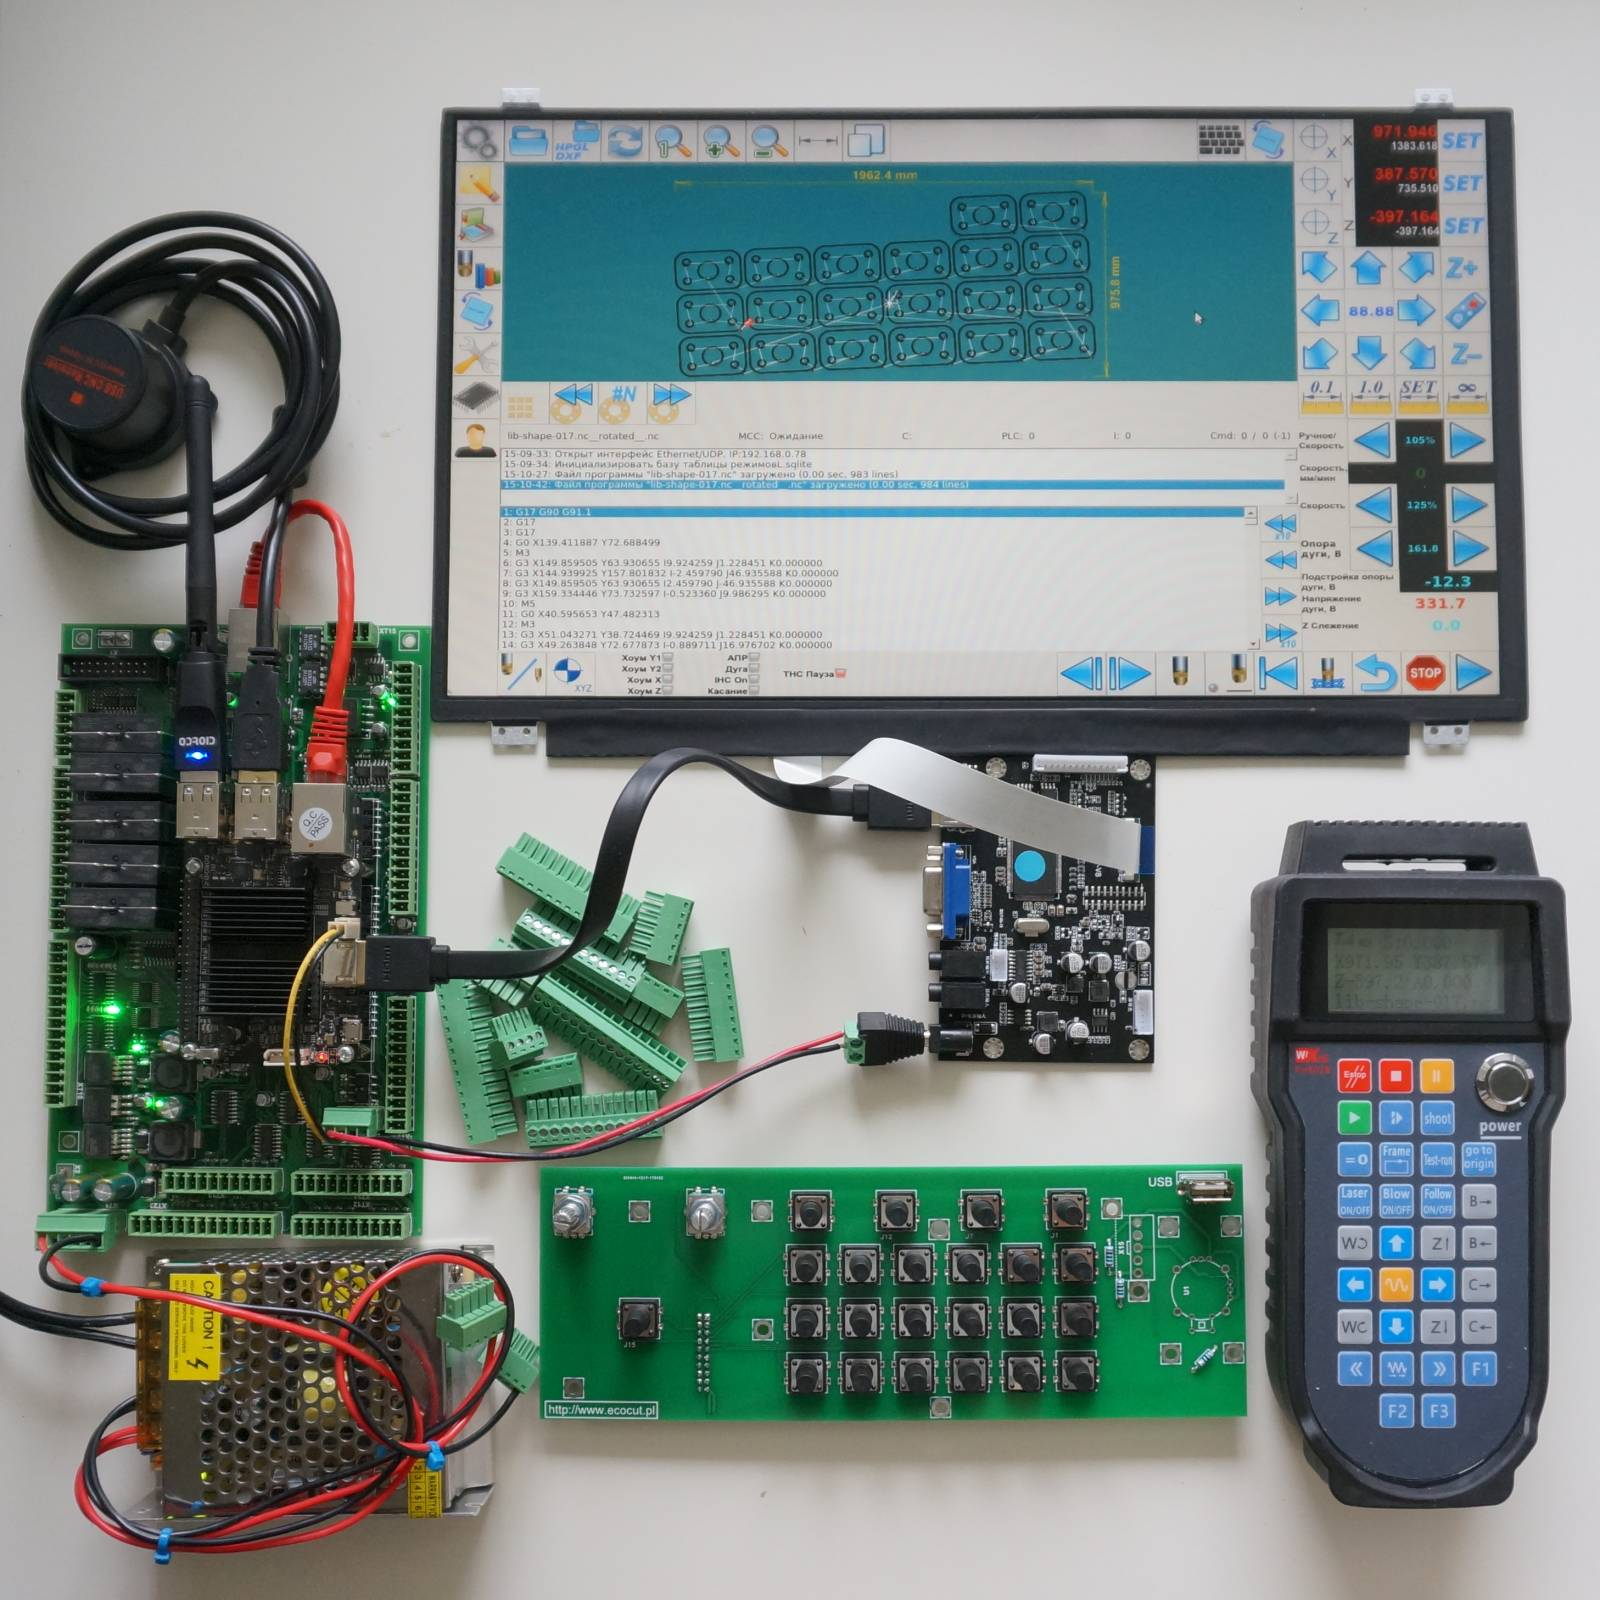 myCNC - advanced CNC control, software - Blog